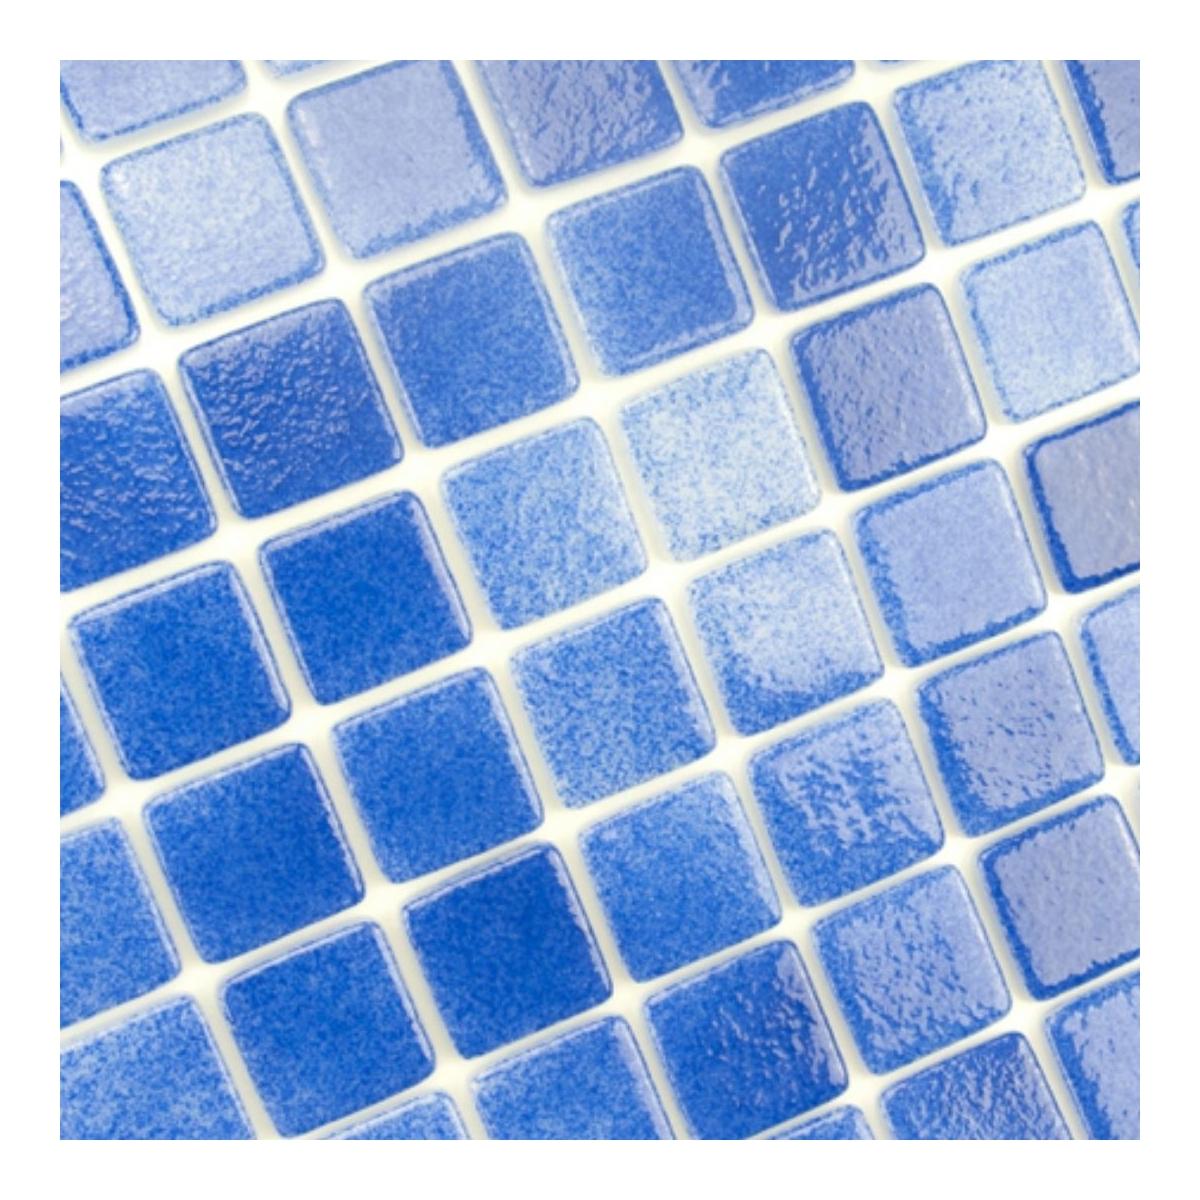 Glass Mosaic Reviglass PS-60 2.5 cm